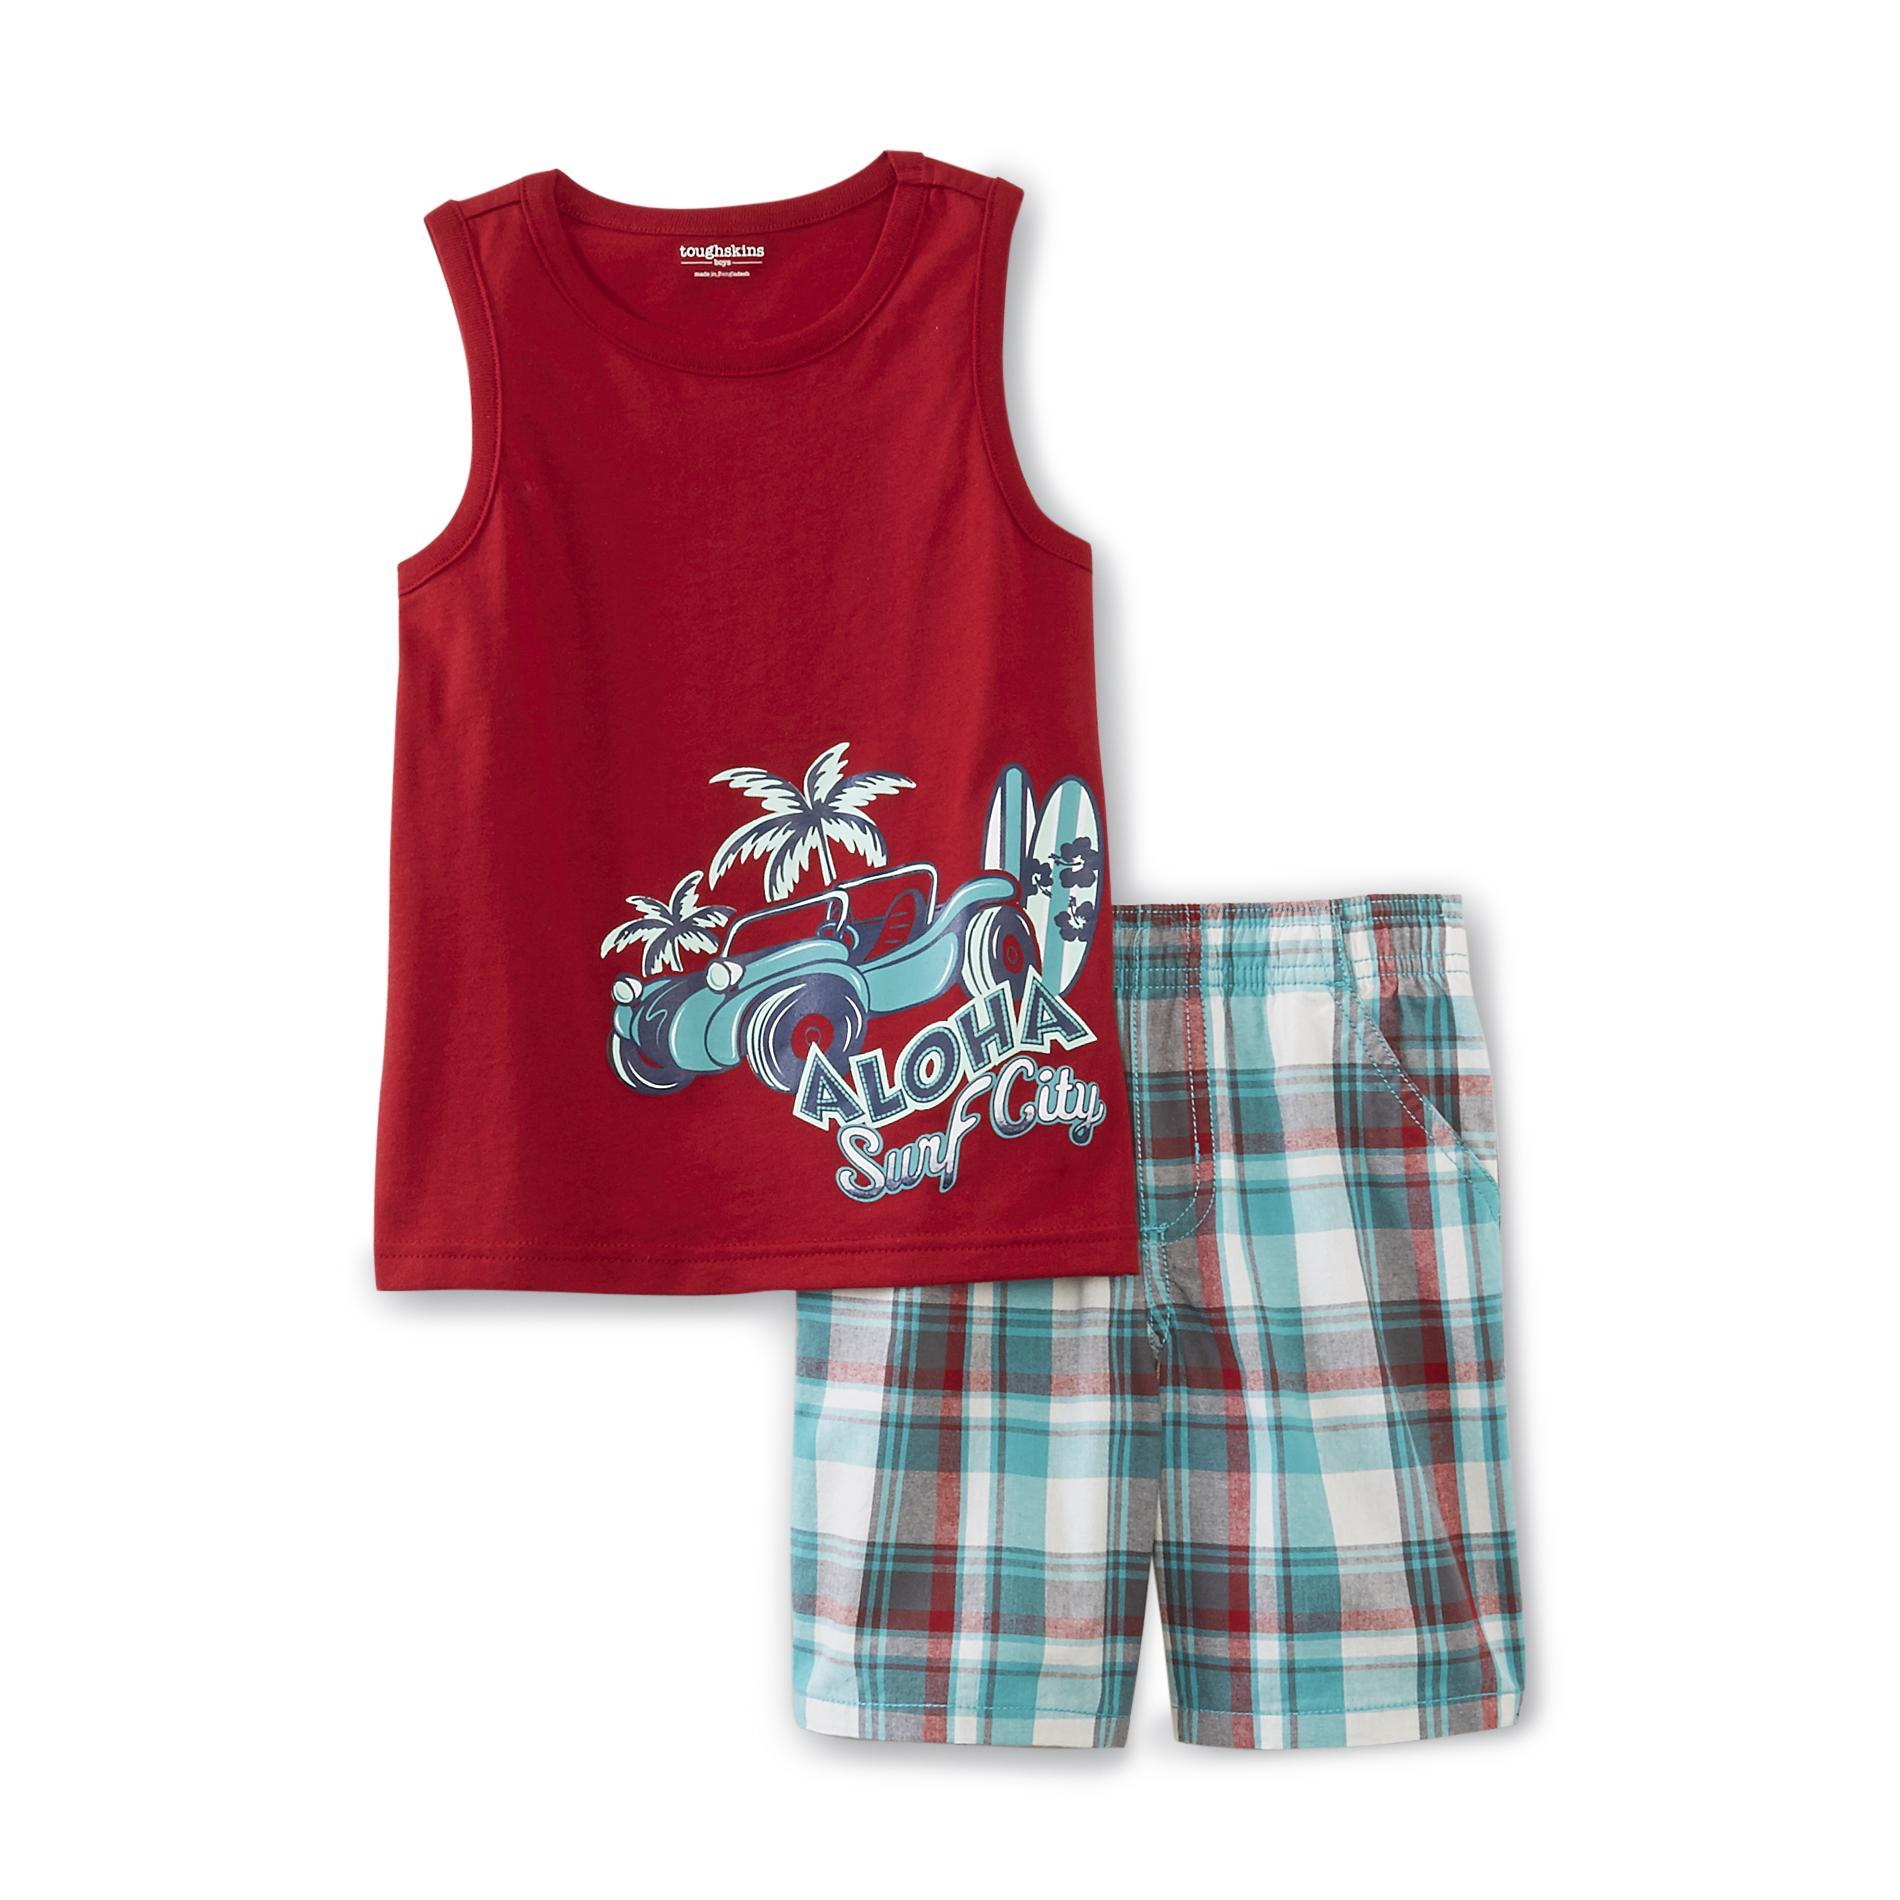 Toughskins Infant & Toddler Boy's Muscle Shirt & Shorts - Surfboards